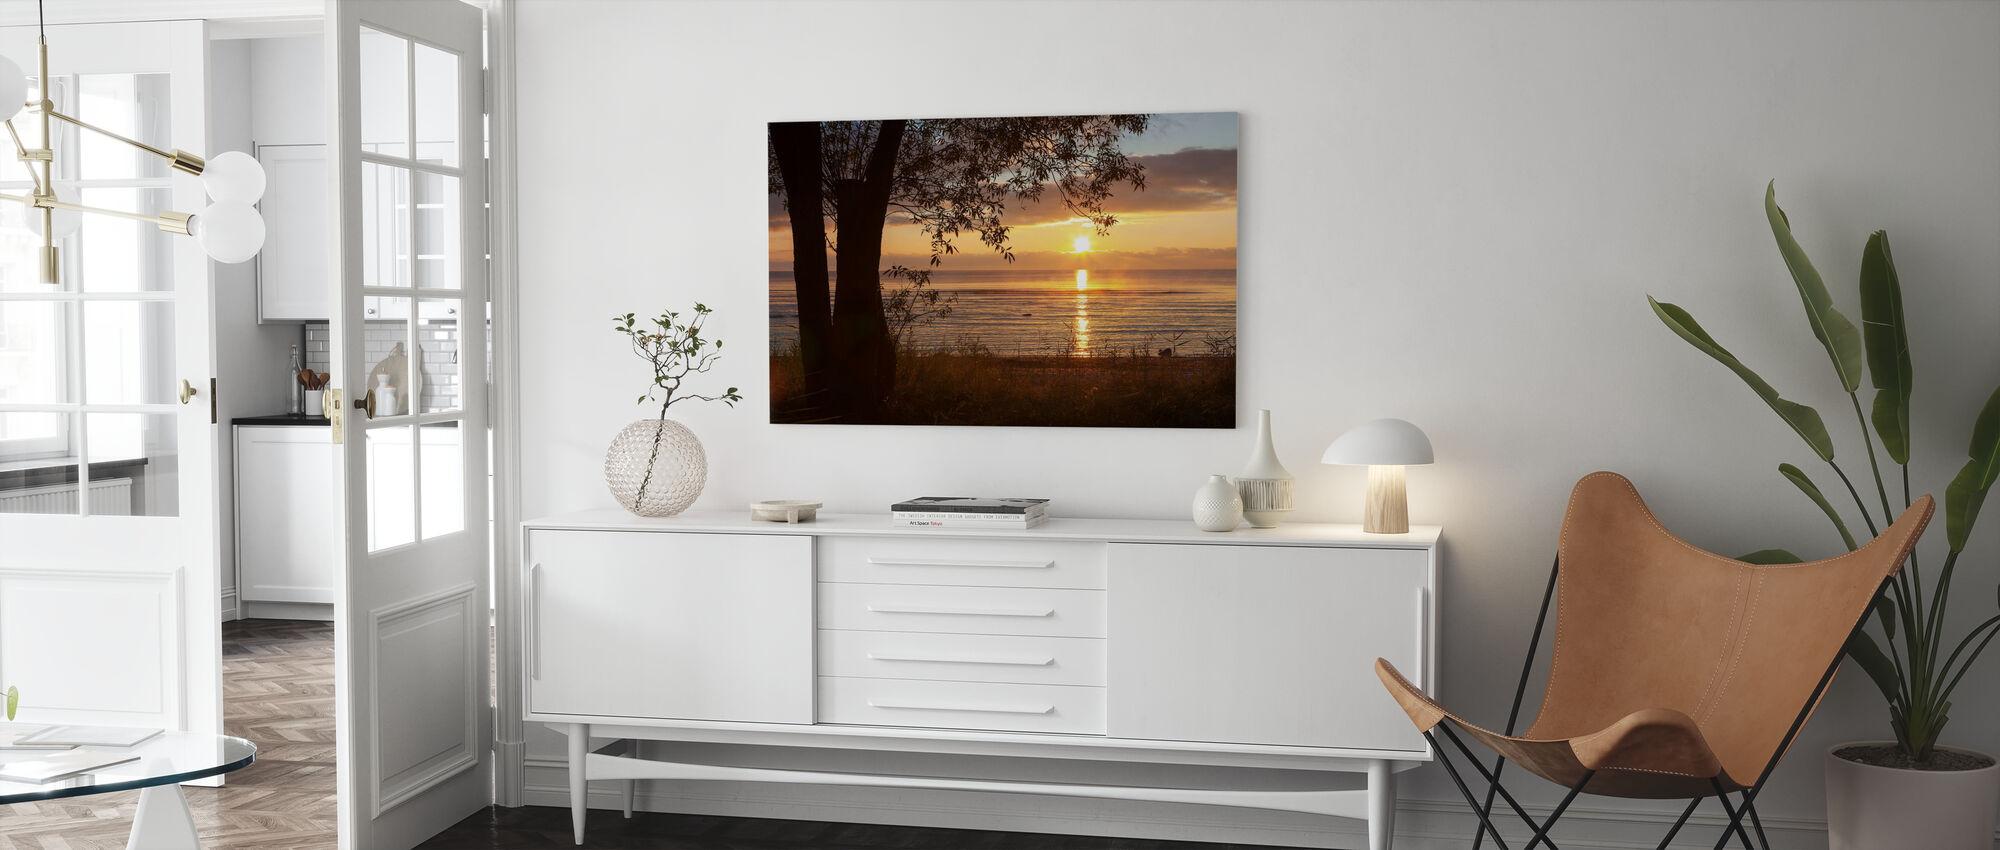 Yellow Sun over the Gotland Sea - Canvas print - Living Room